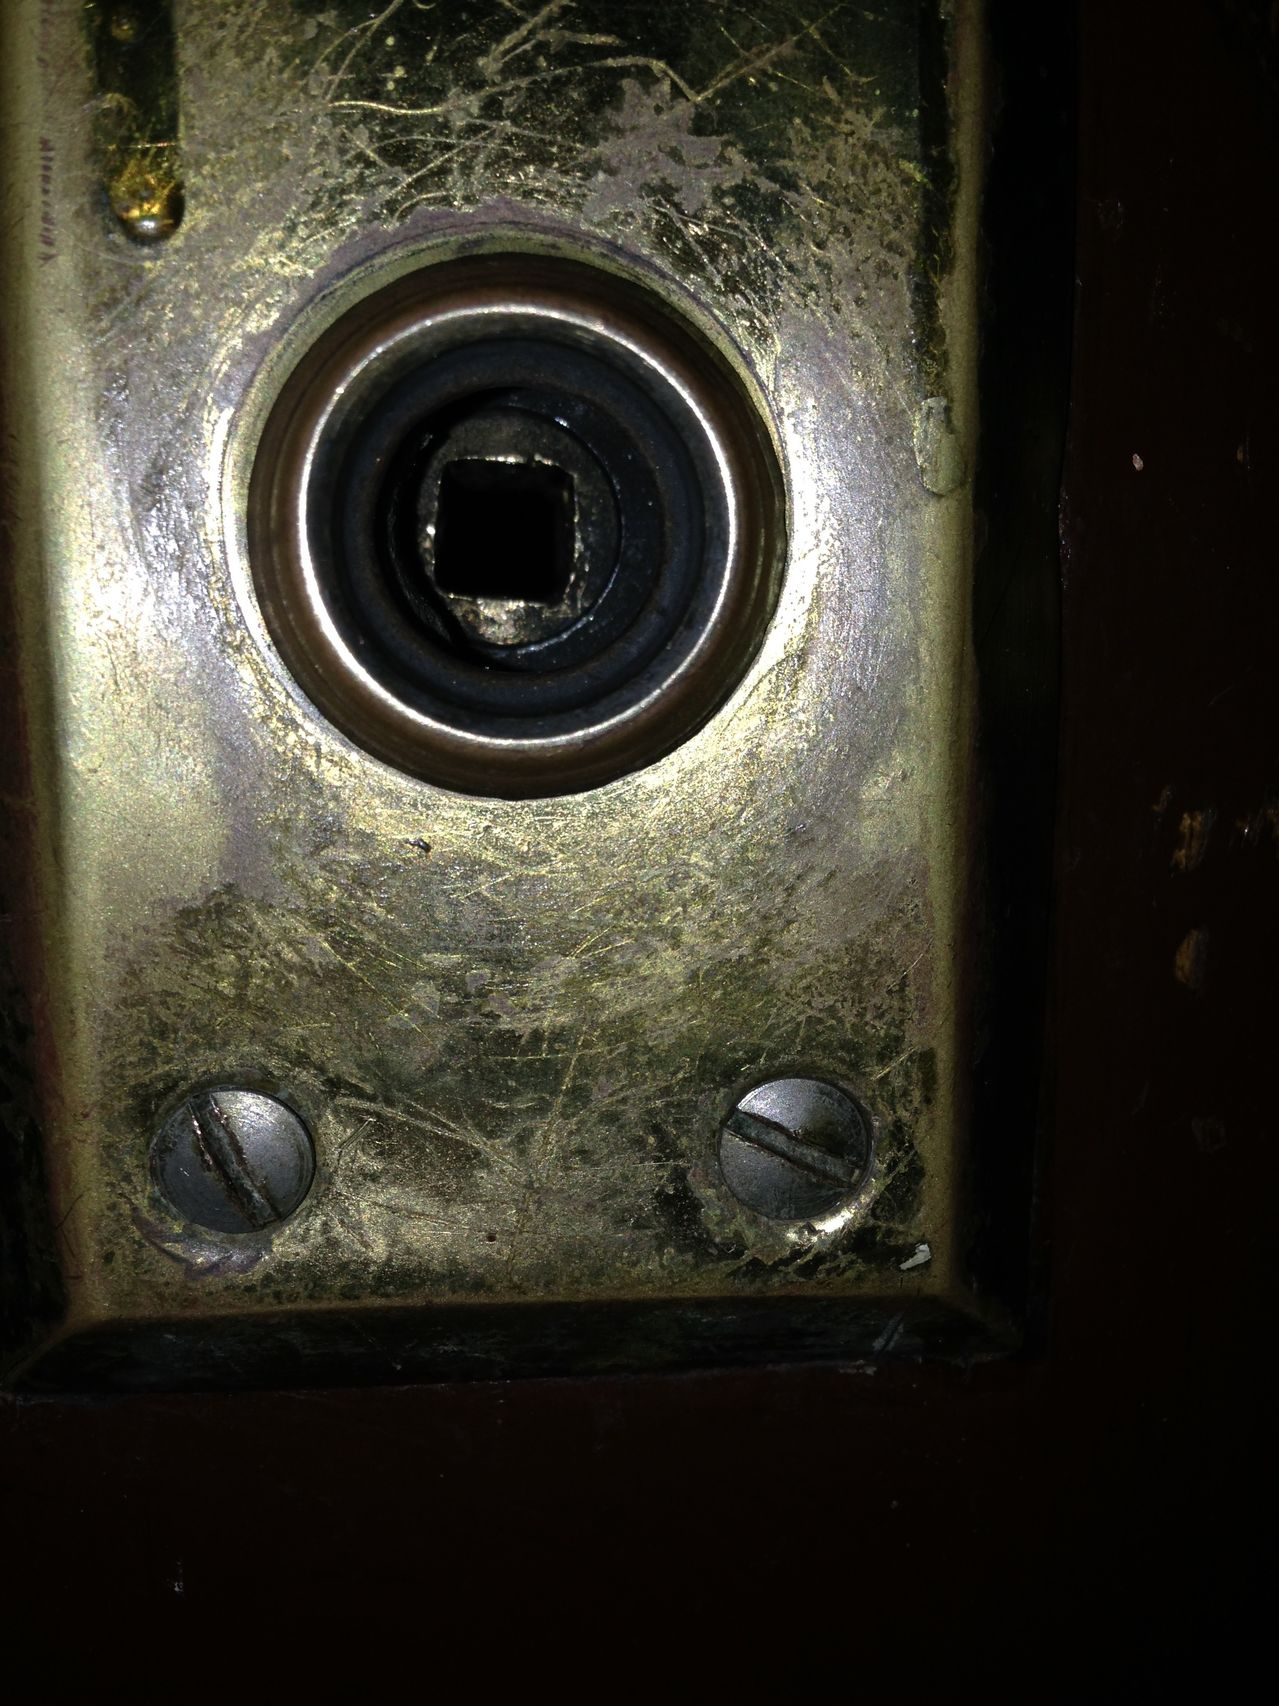 door knob locked from inside photo - 18